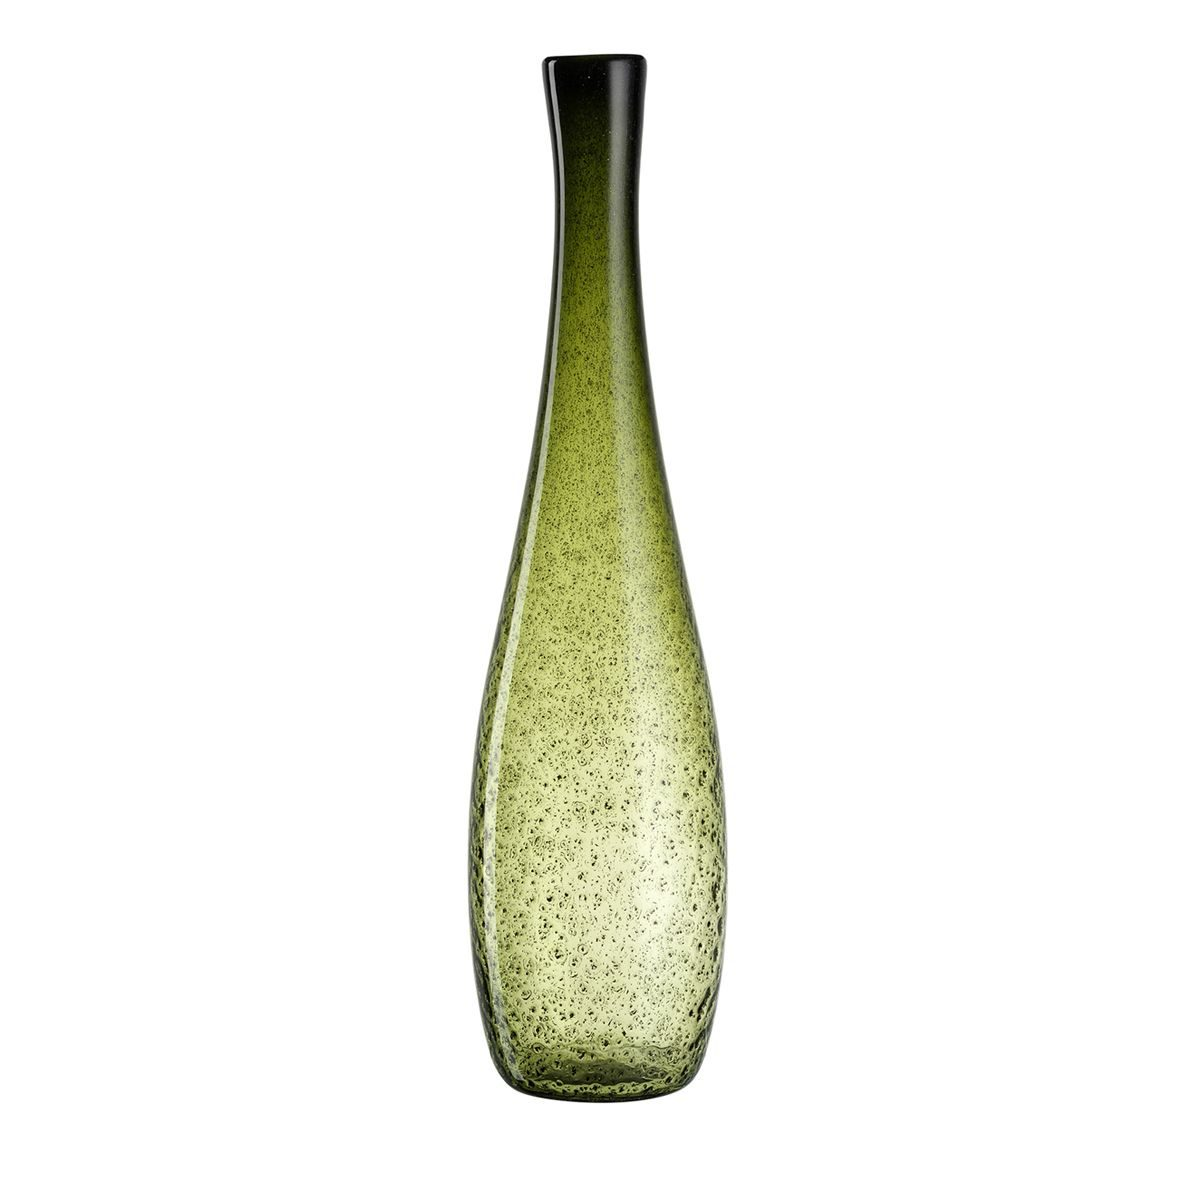 034909 0 k 1200x1200 - Vază decorativă Giardino verde powd 60 cm (L034909)